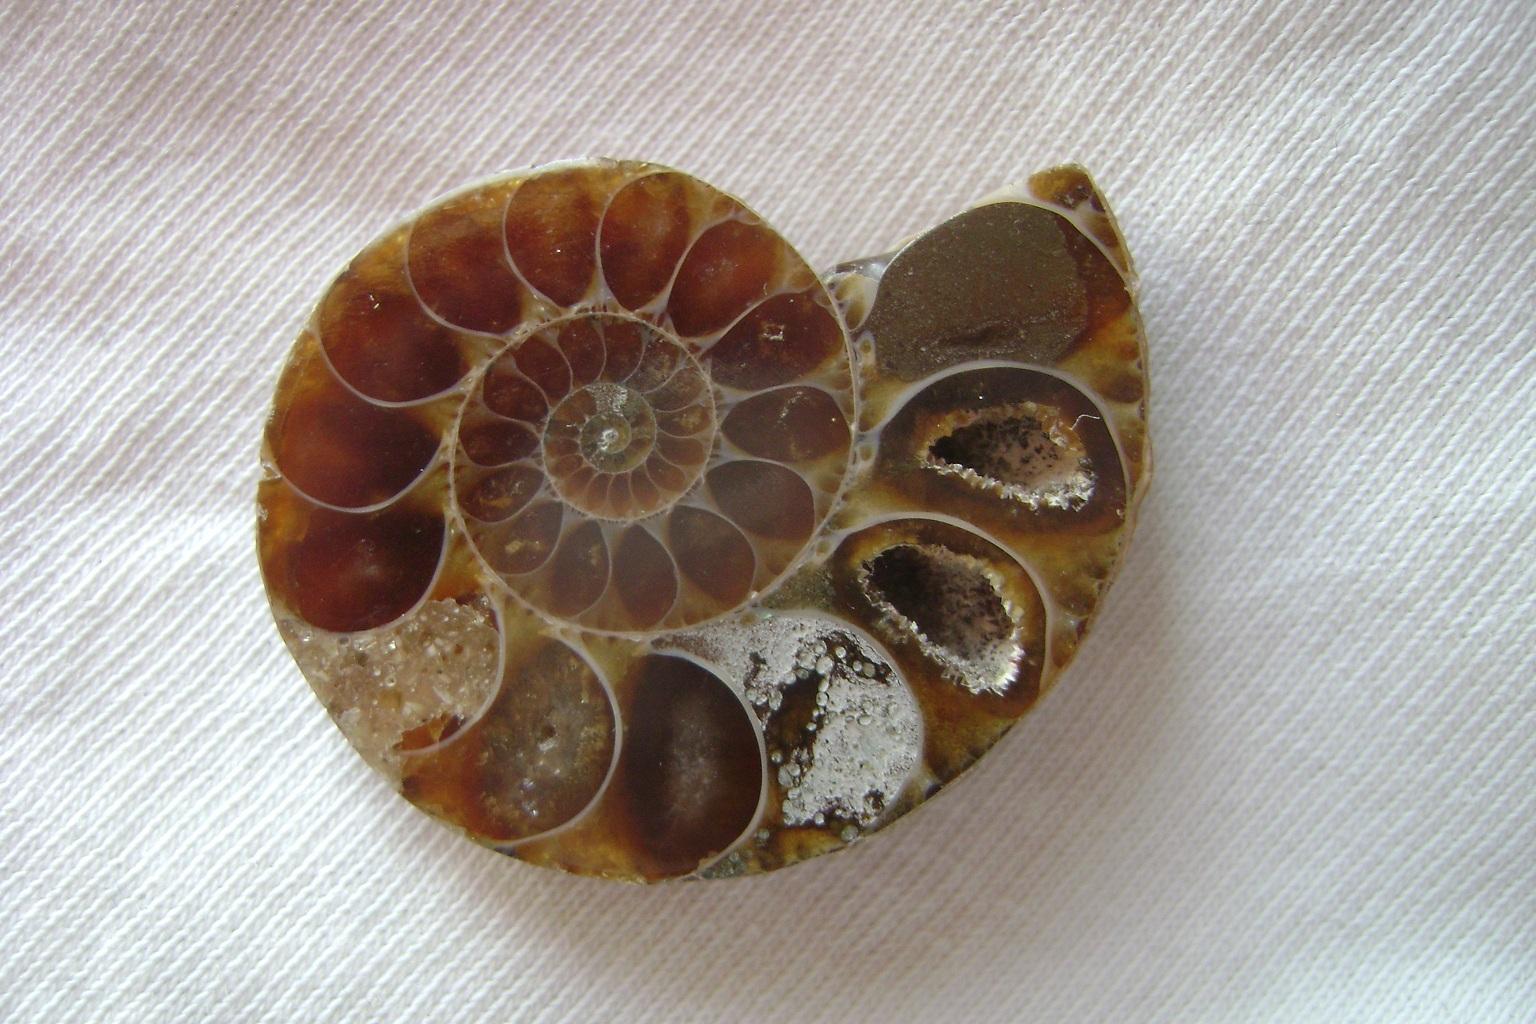 Kristal_Amonit_fosil__1.JPG